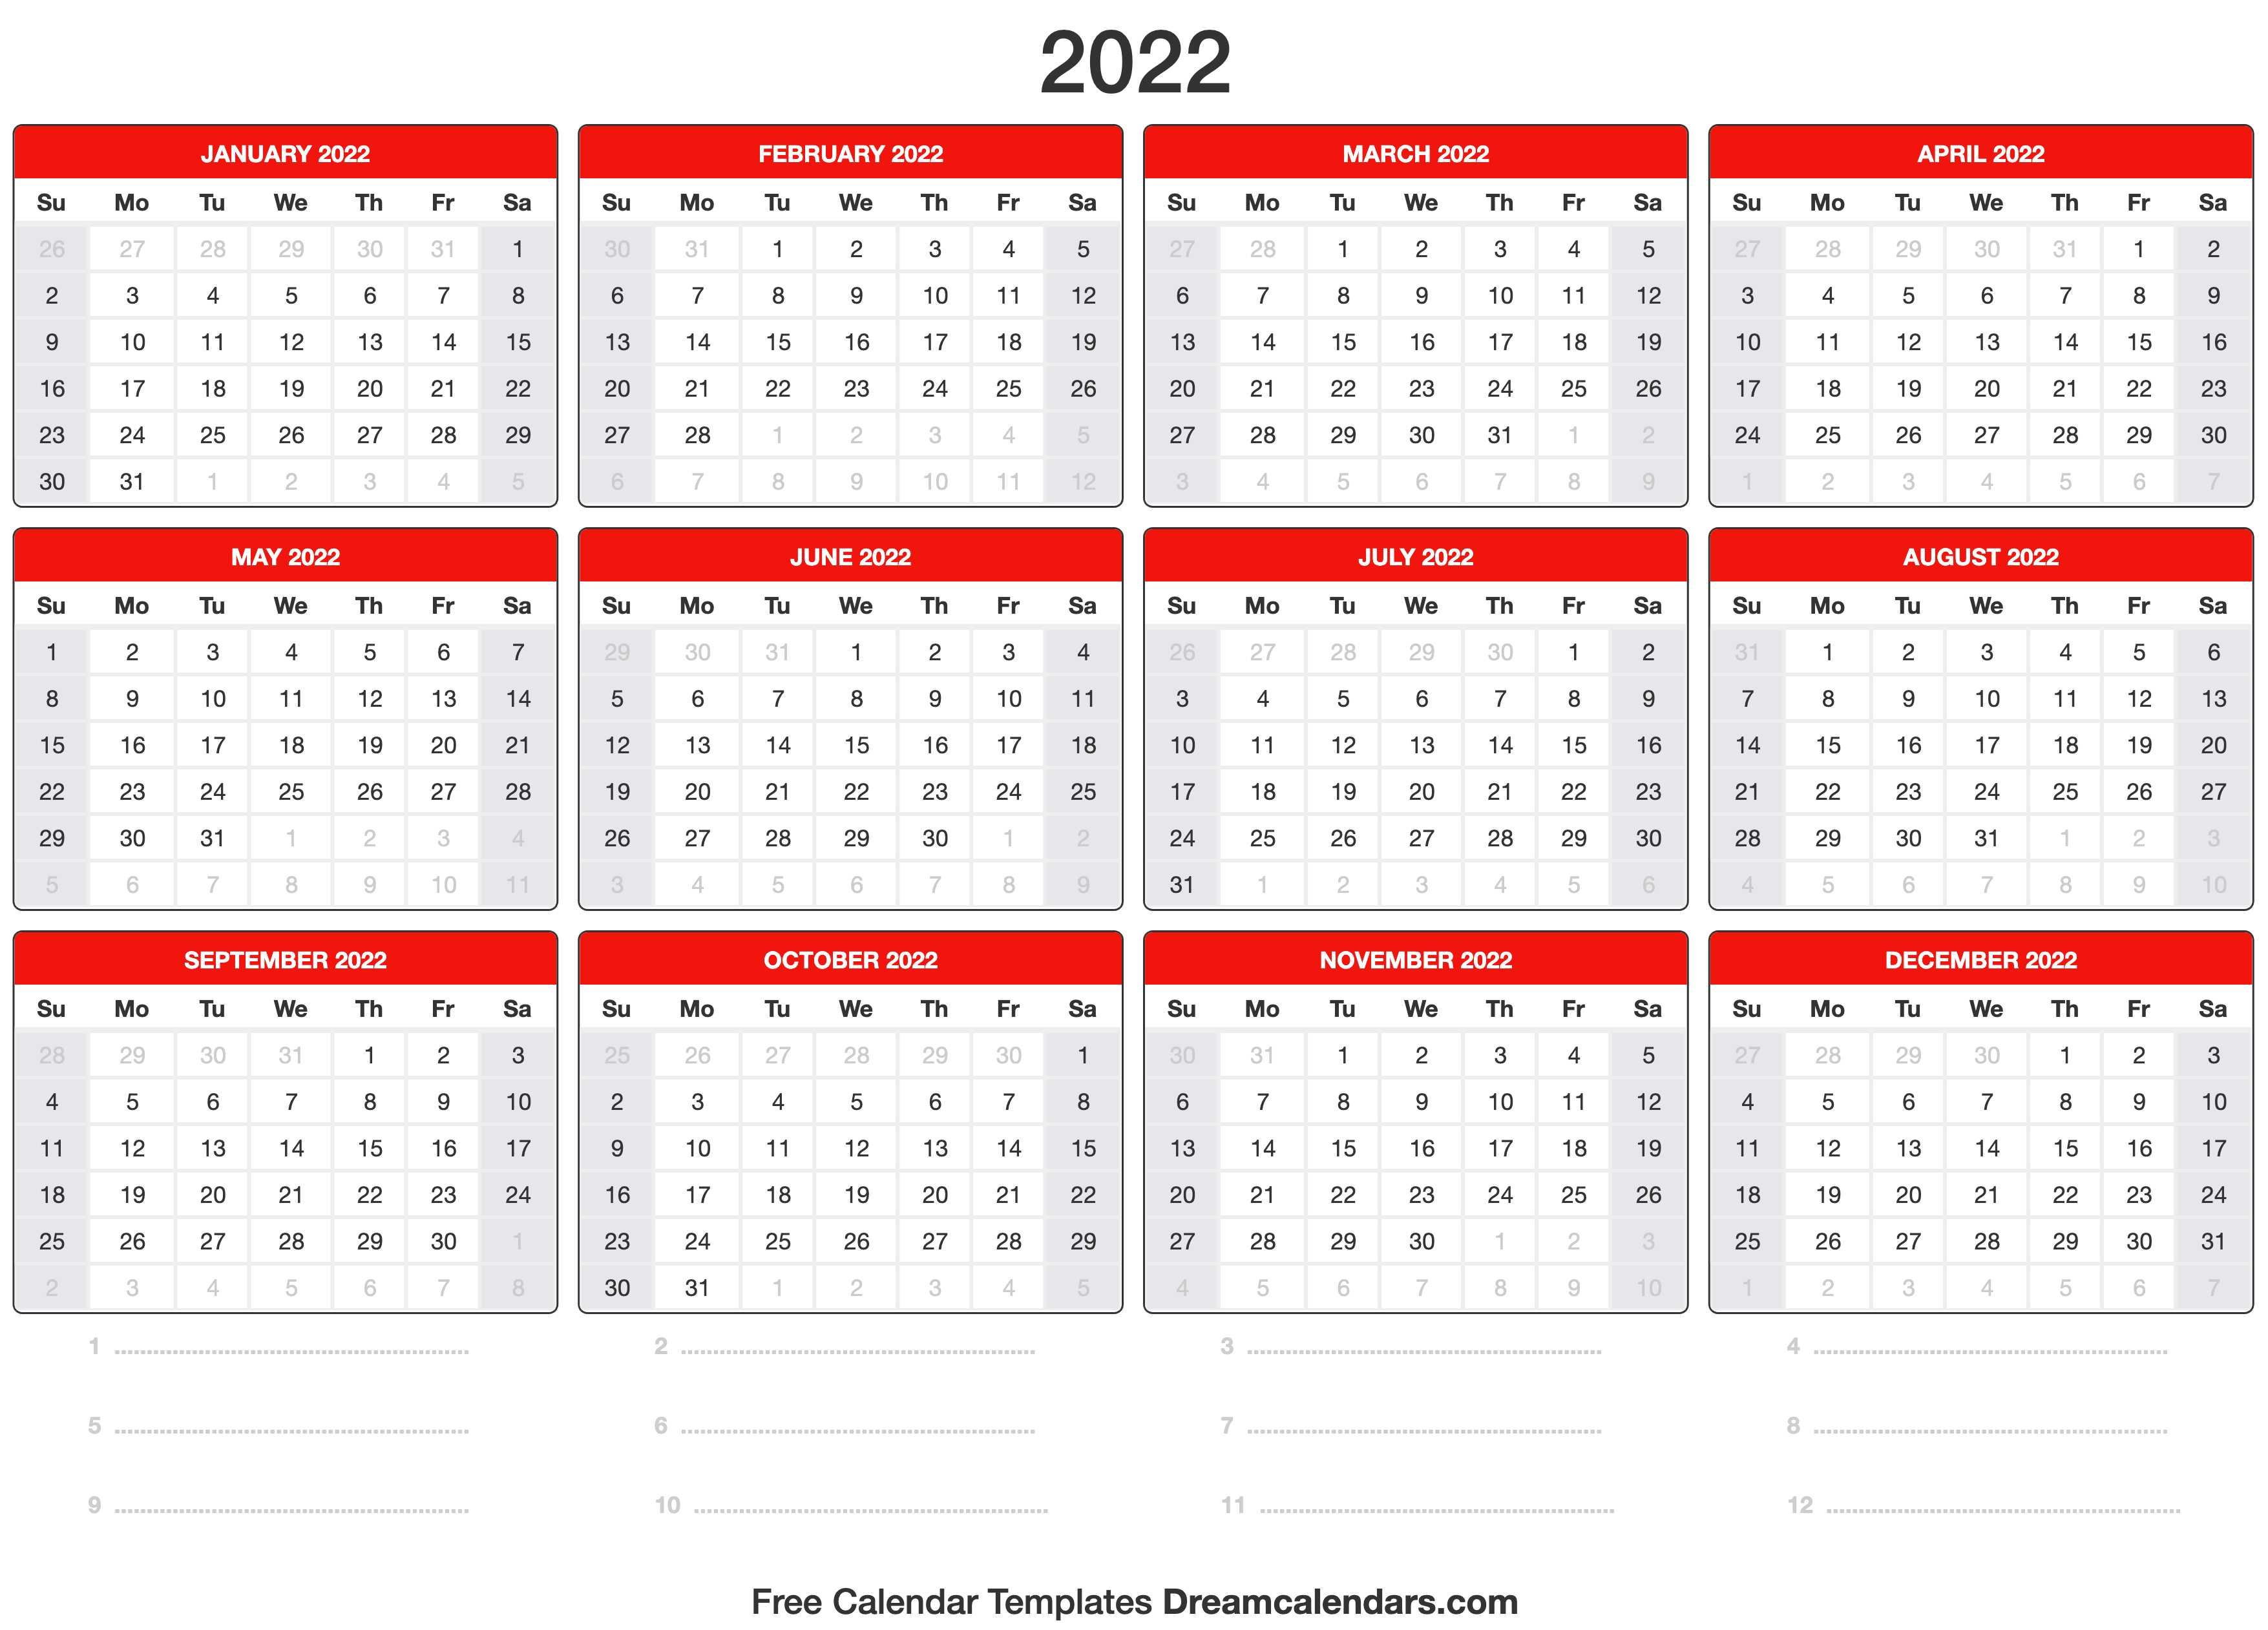 Free may 2022 calendar printable calendar of the year: 2022 Calendar